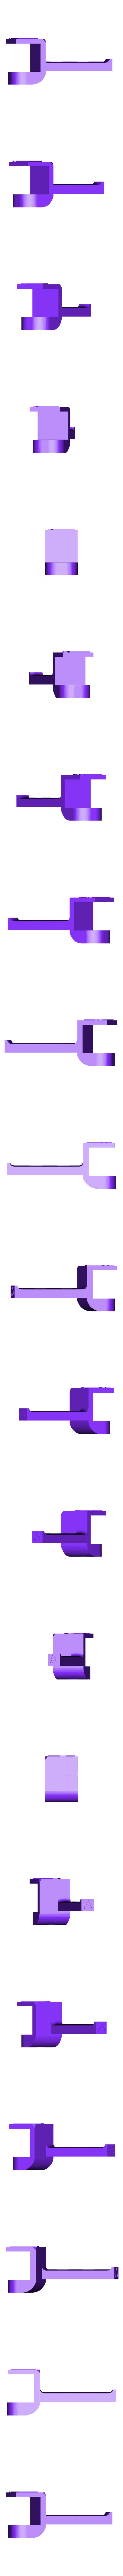 derouleur_de_bobines_LONG.stl Download free STL file Spool holder • 3D print object, dagomafr